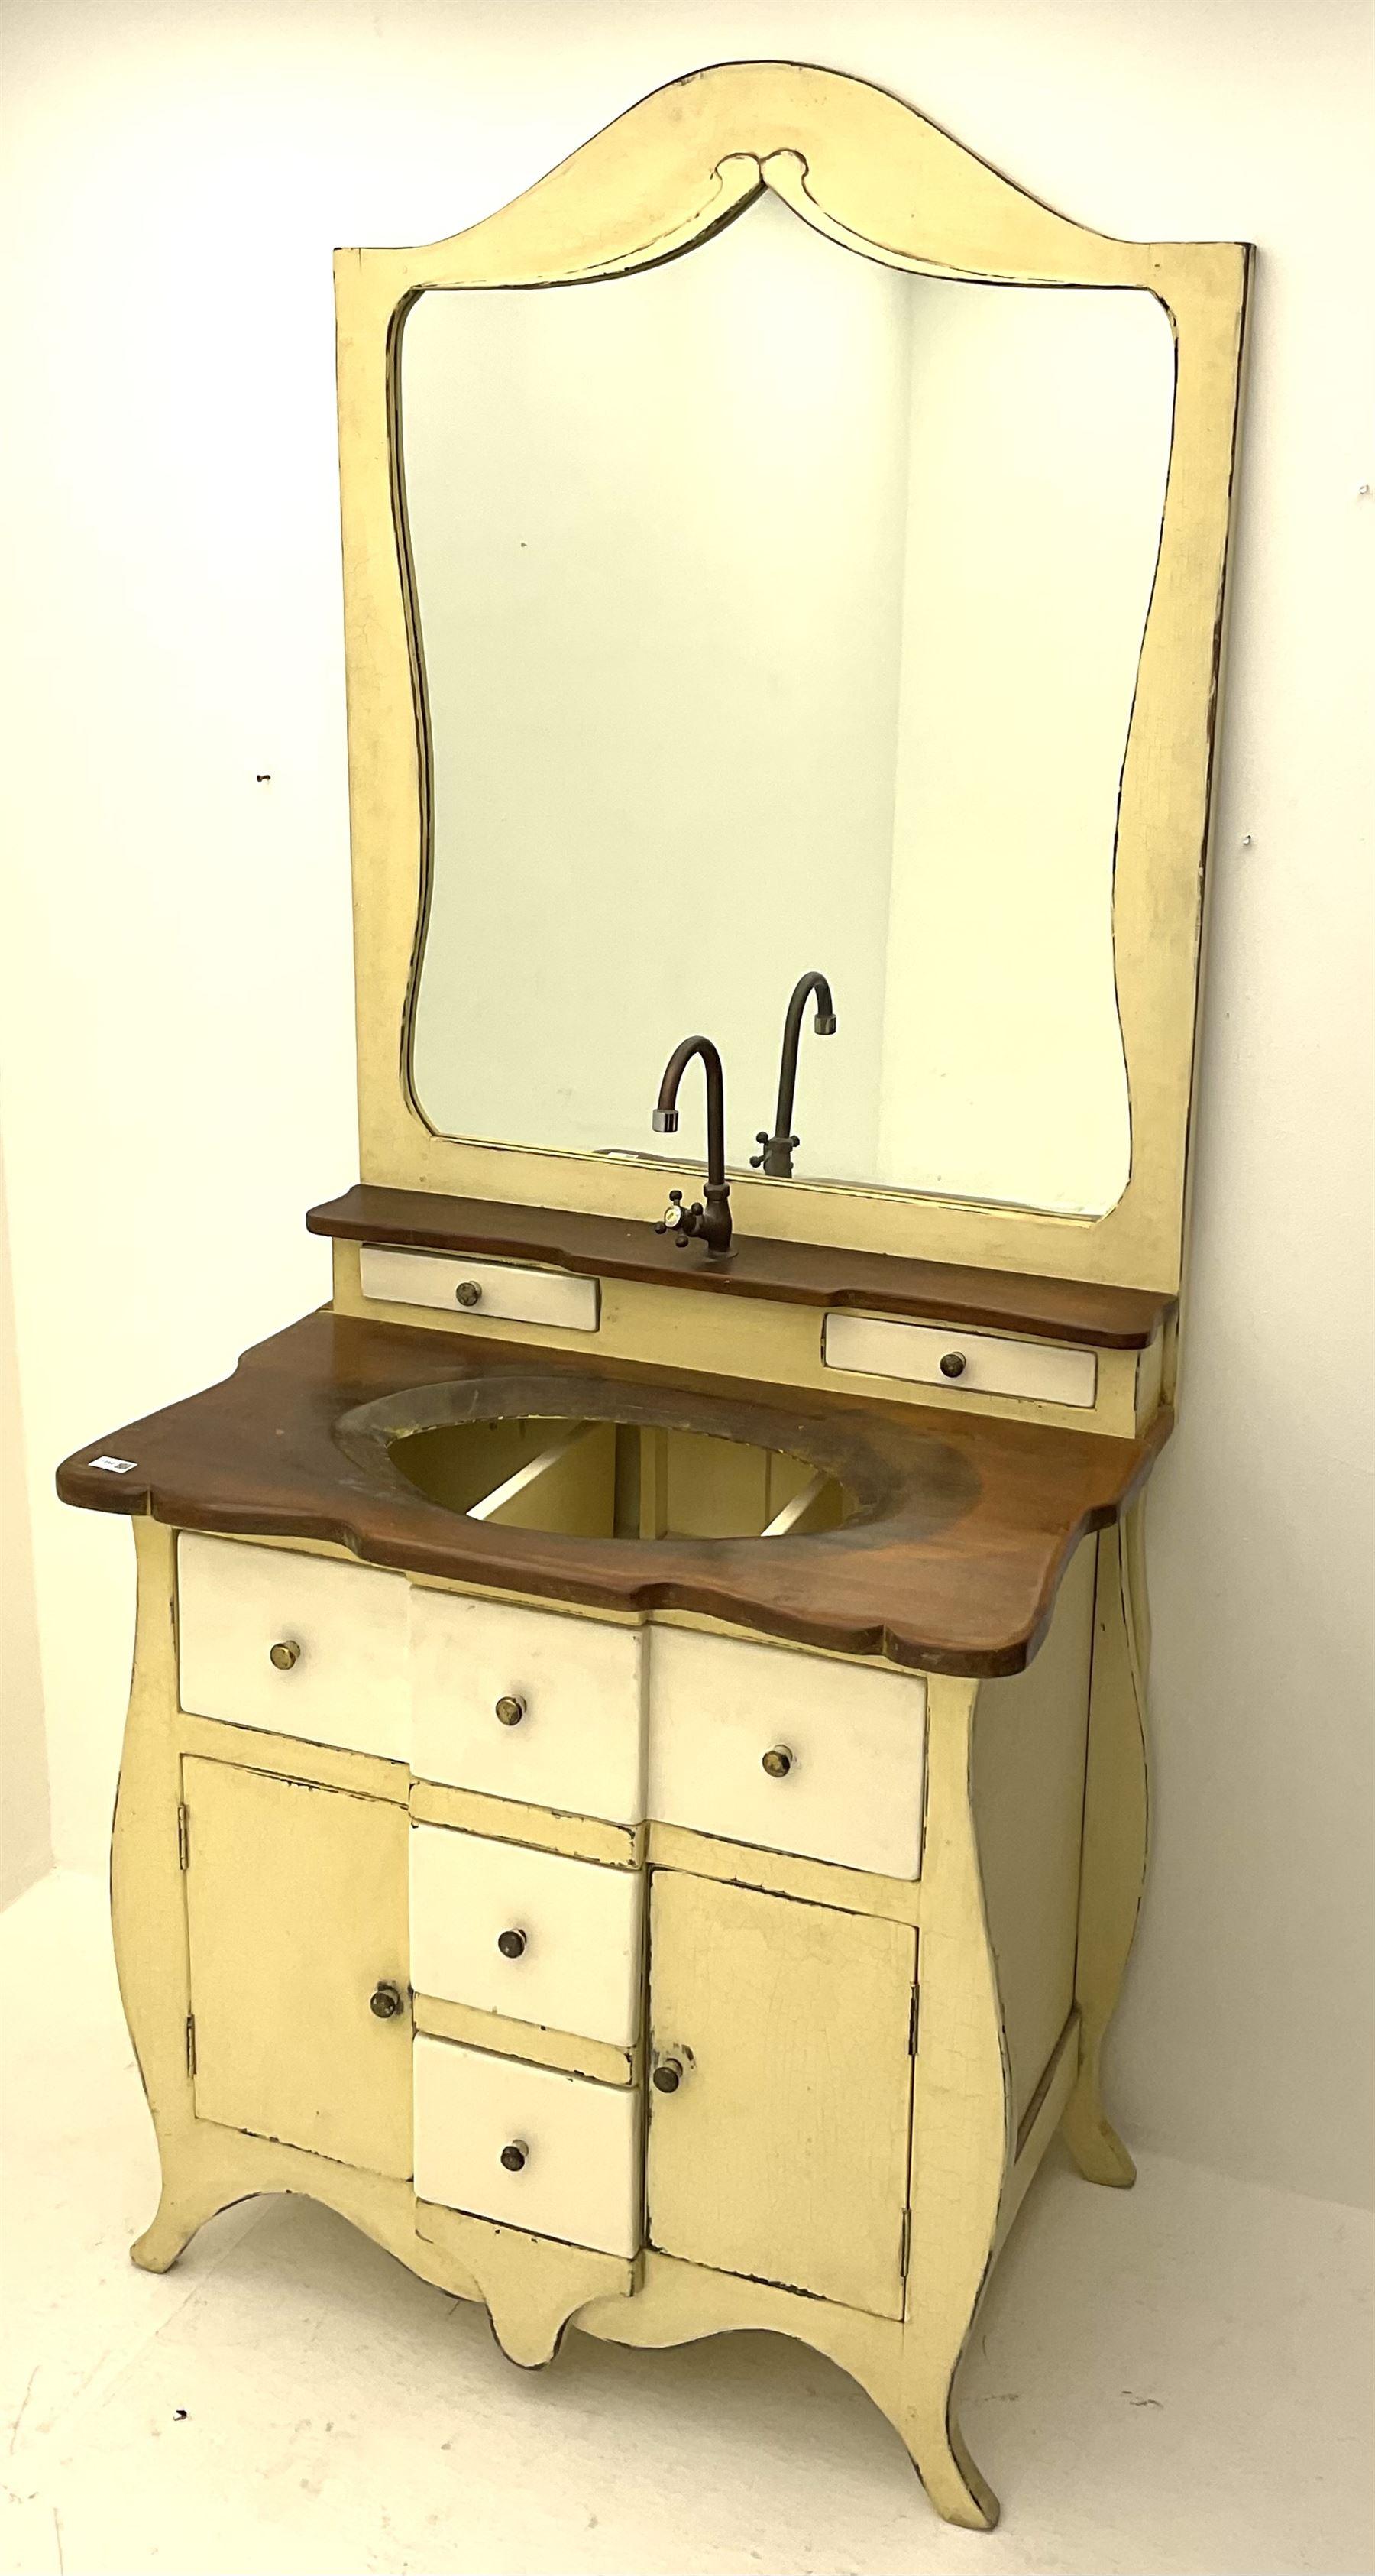 Distressed cream painted vanity unit - Image 2 of 2